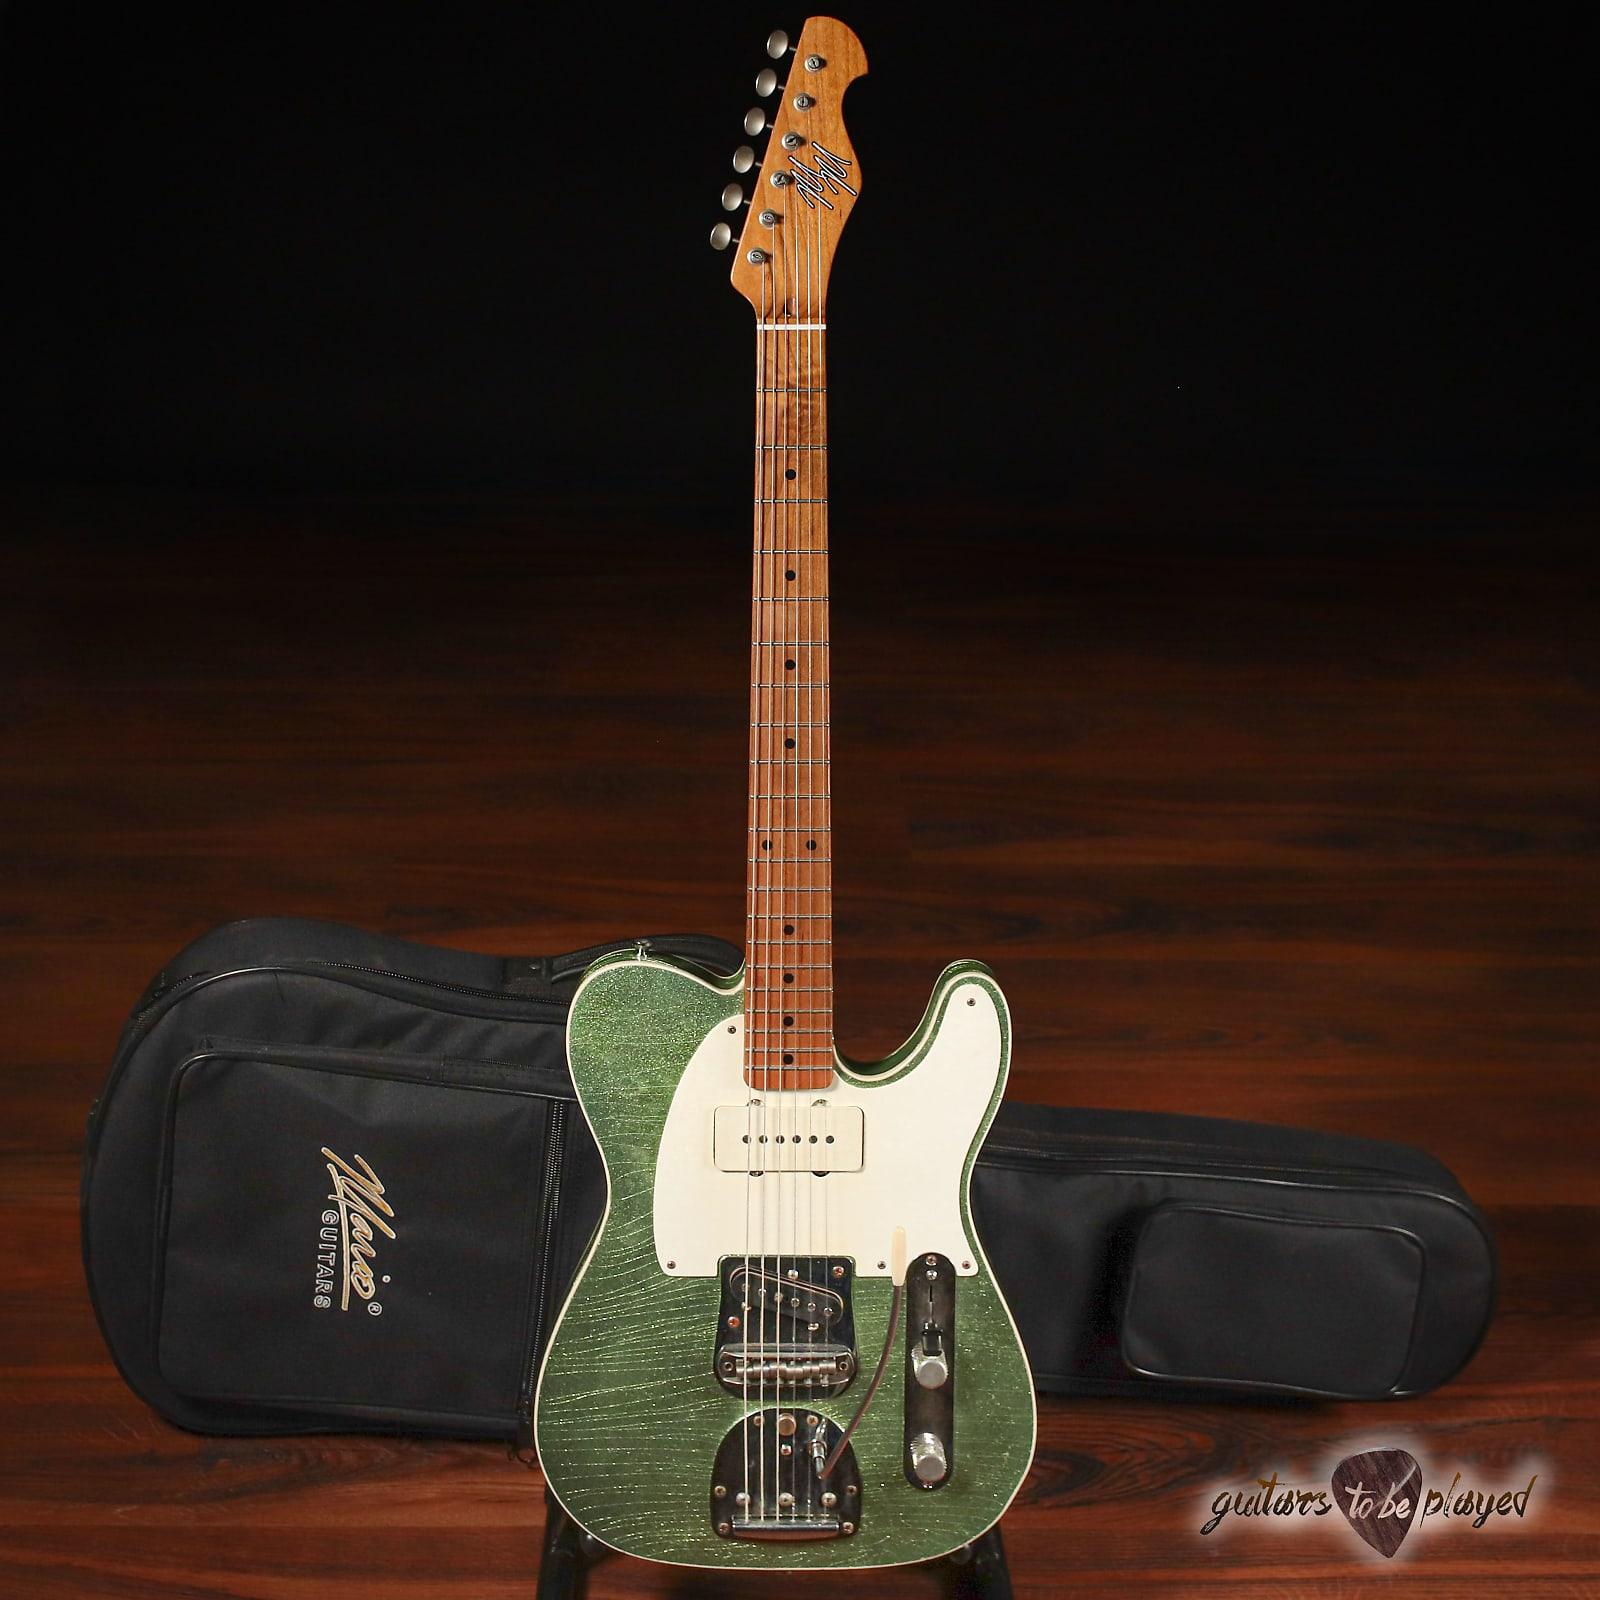 Mario Martin Guitars Swamp Ash T-Jazz  w/ Fralins & StayTrem Bridge – Coke Bottle Green Flake (DEMO)